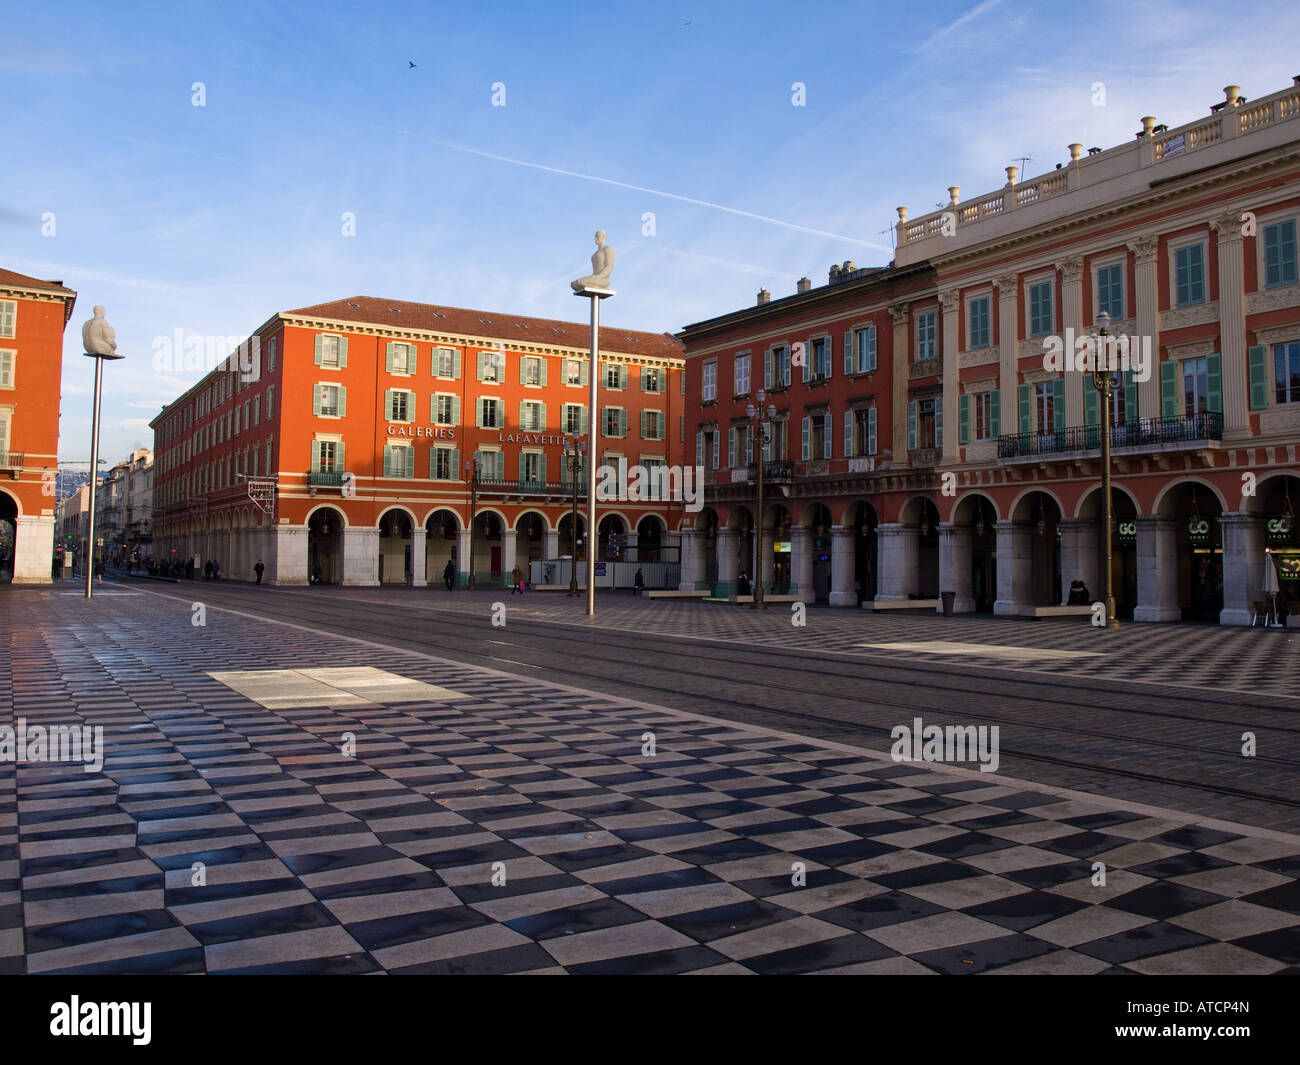 Place Masséna in Nice, France. - Stock Image